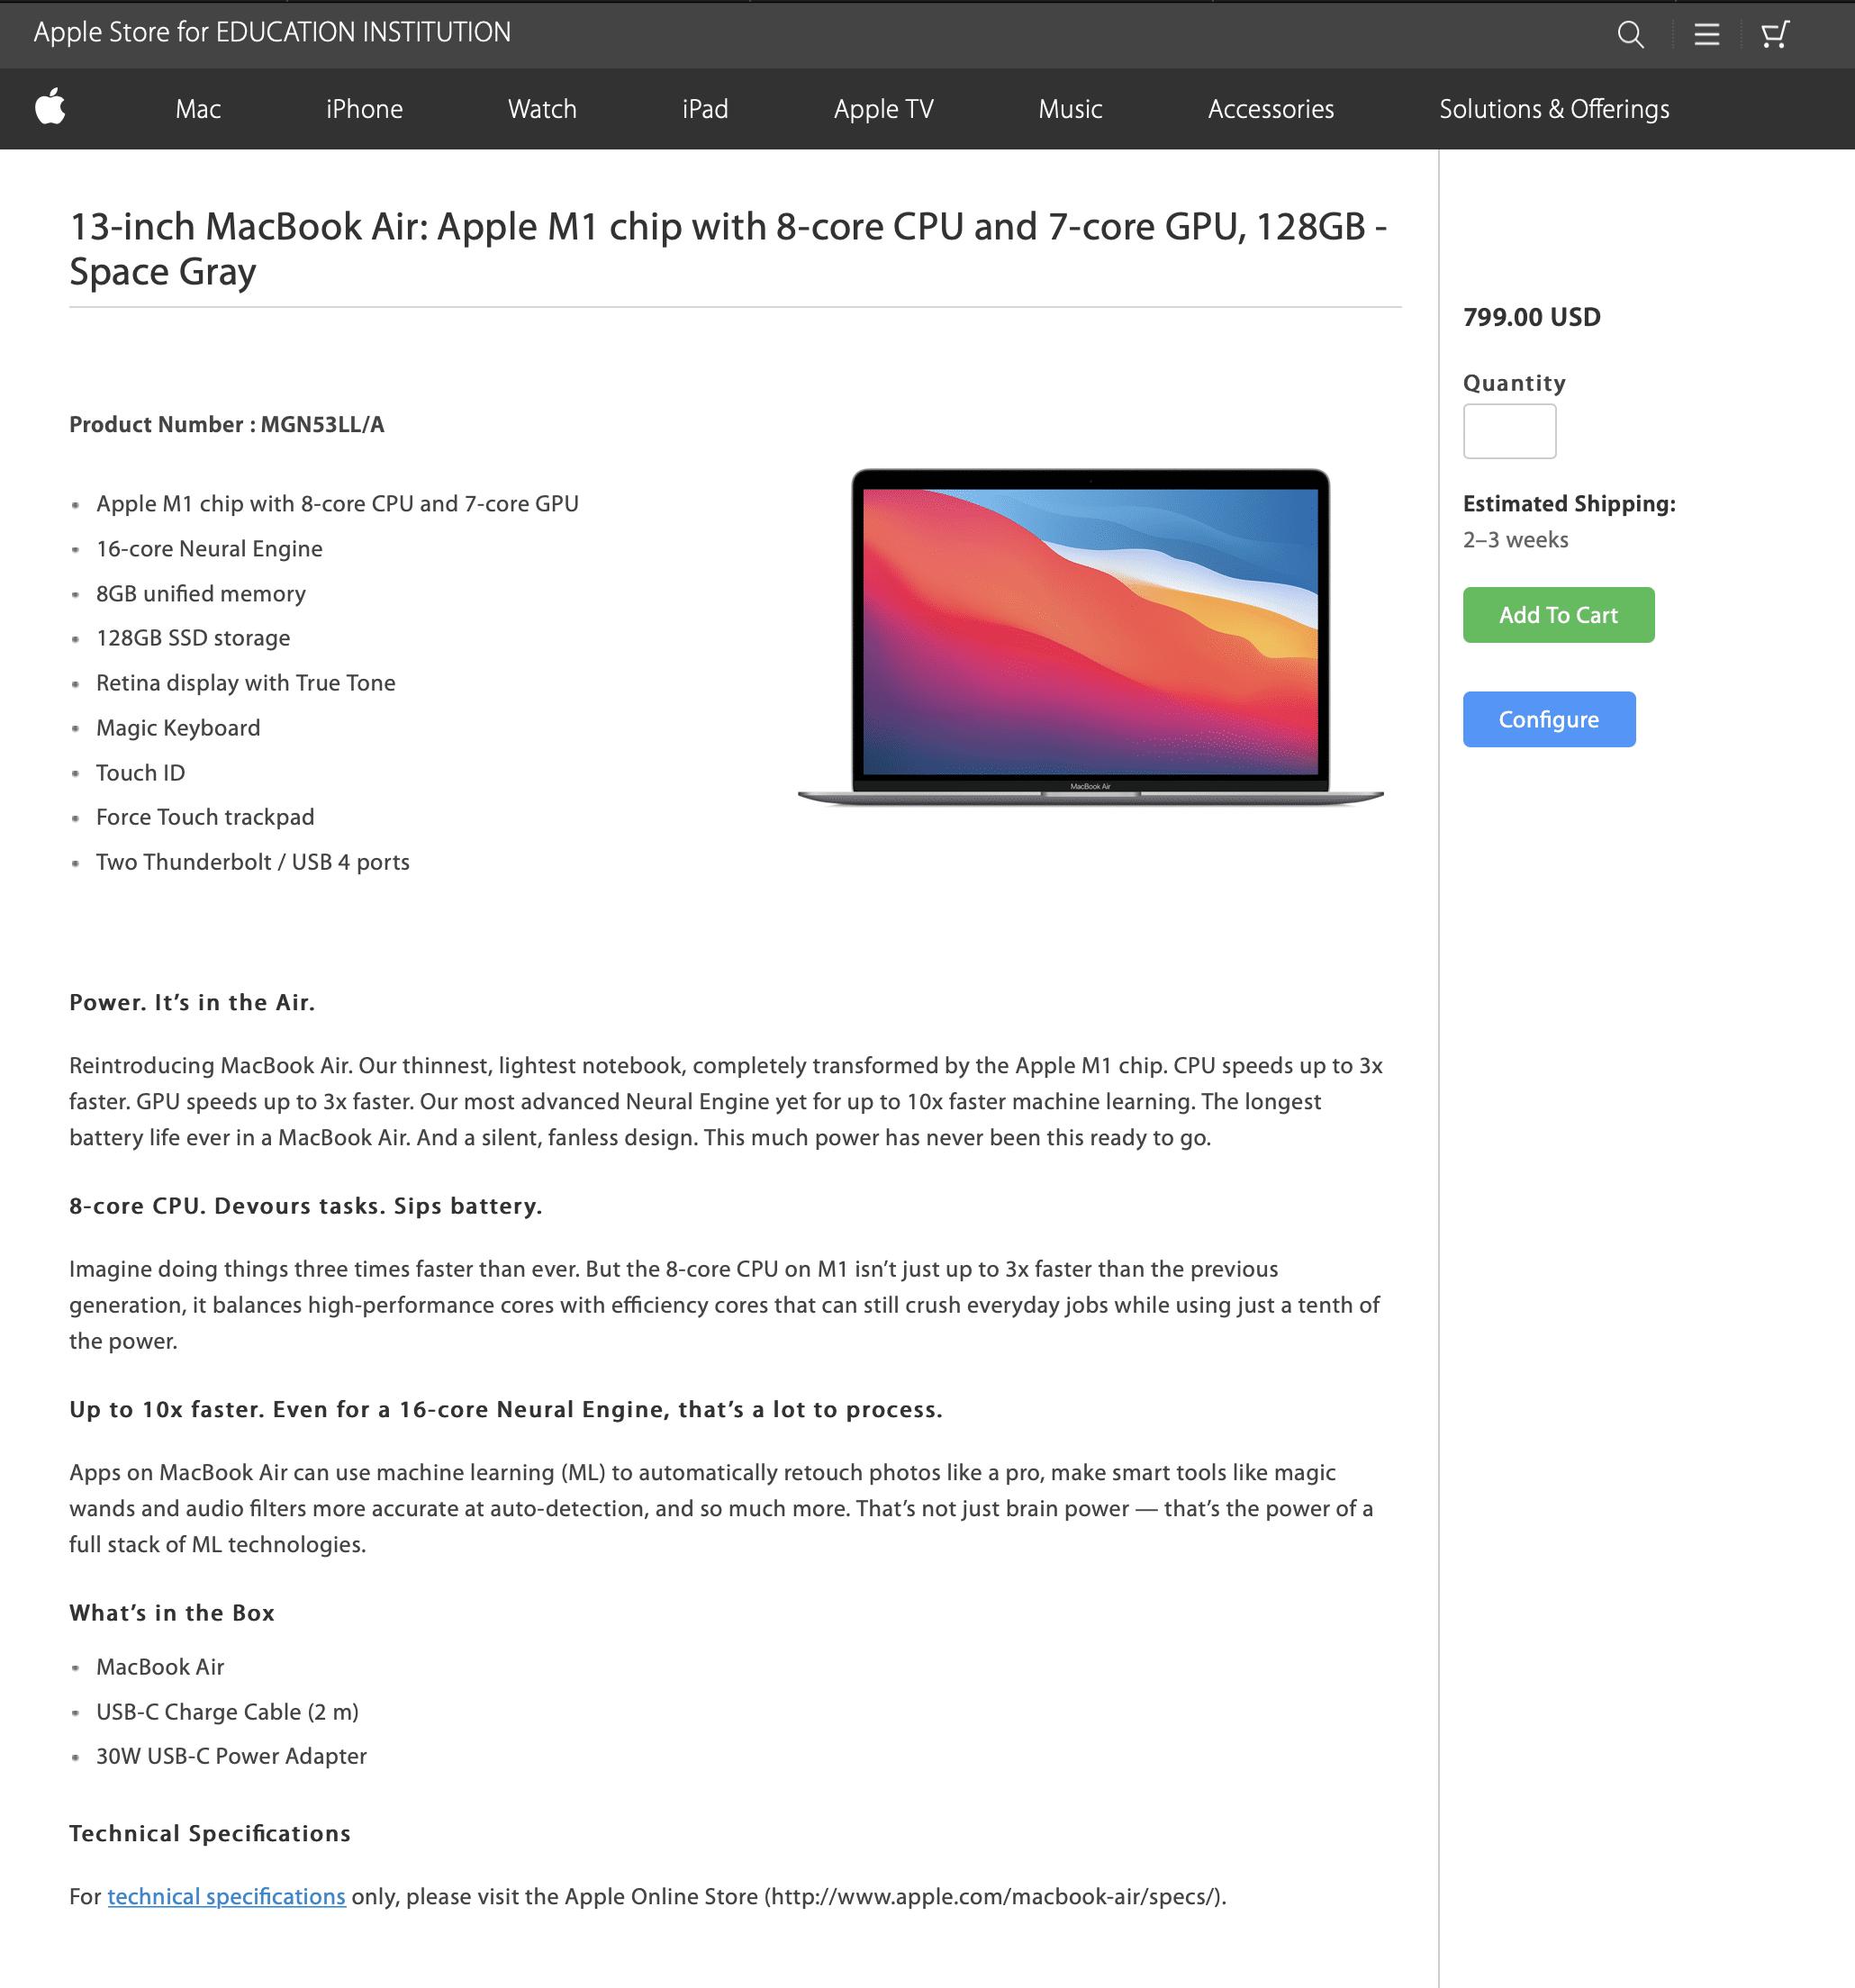 MacBook Air de US$799 na loja educacional da Apple